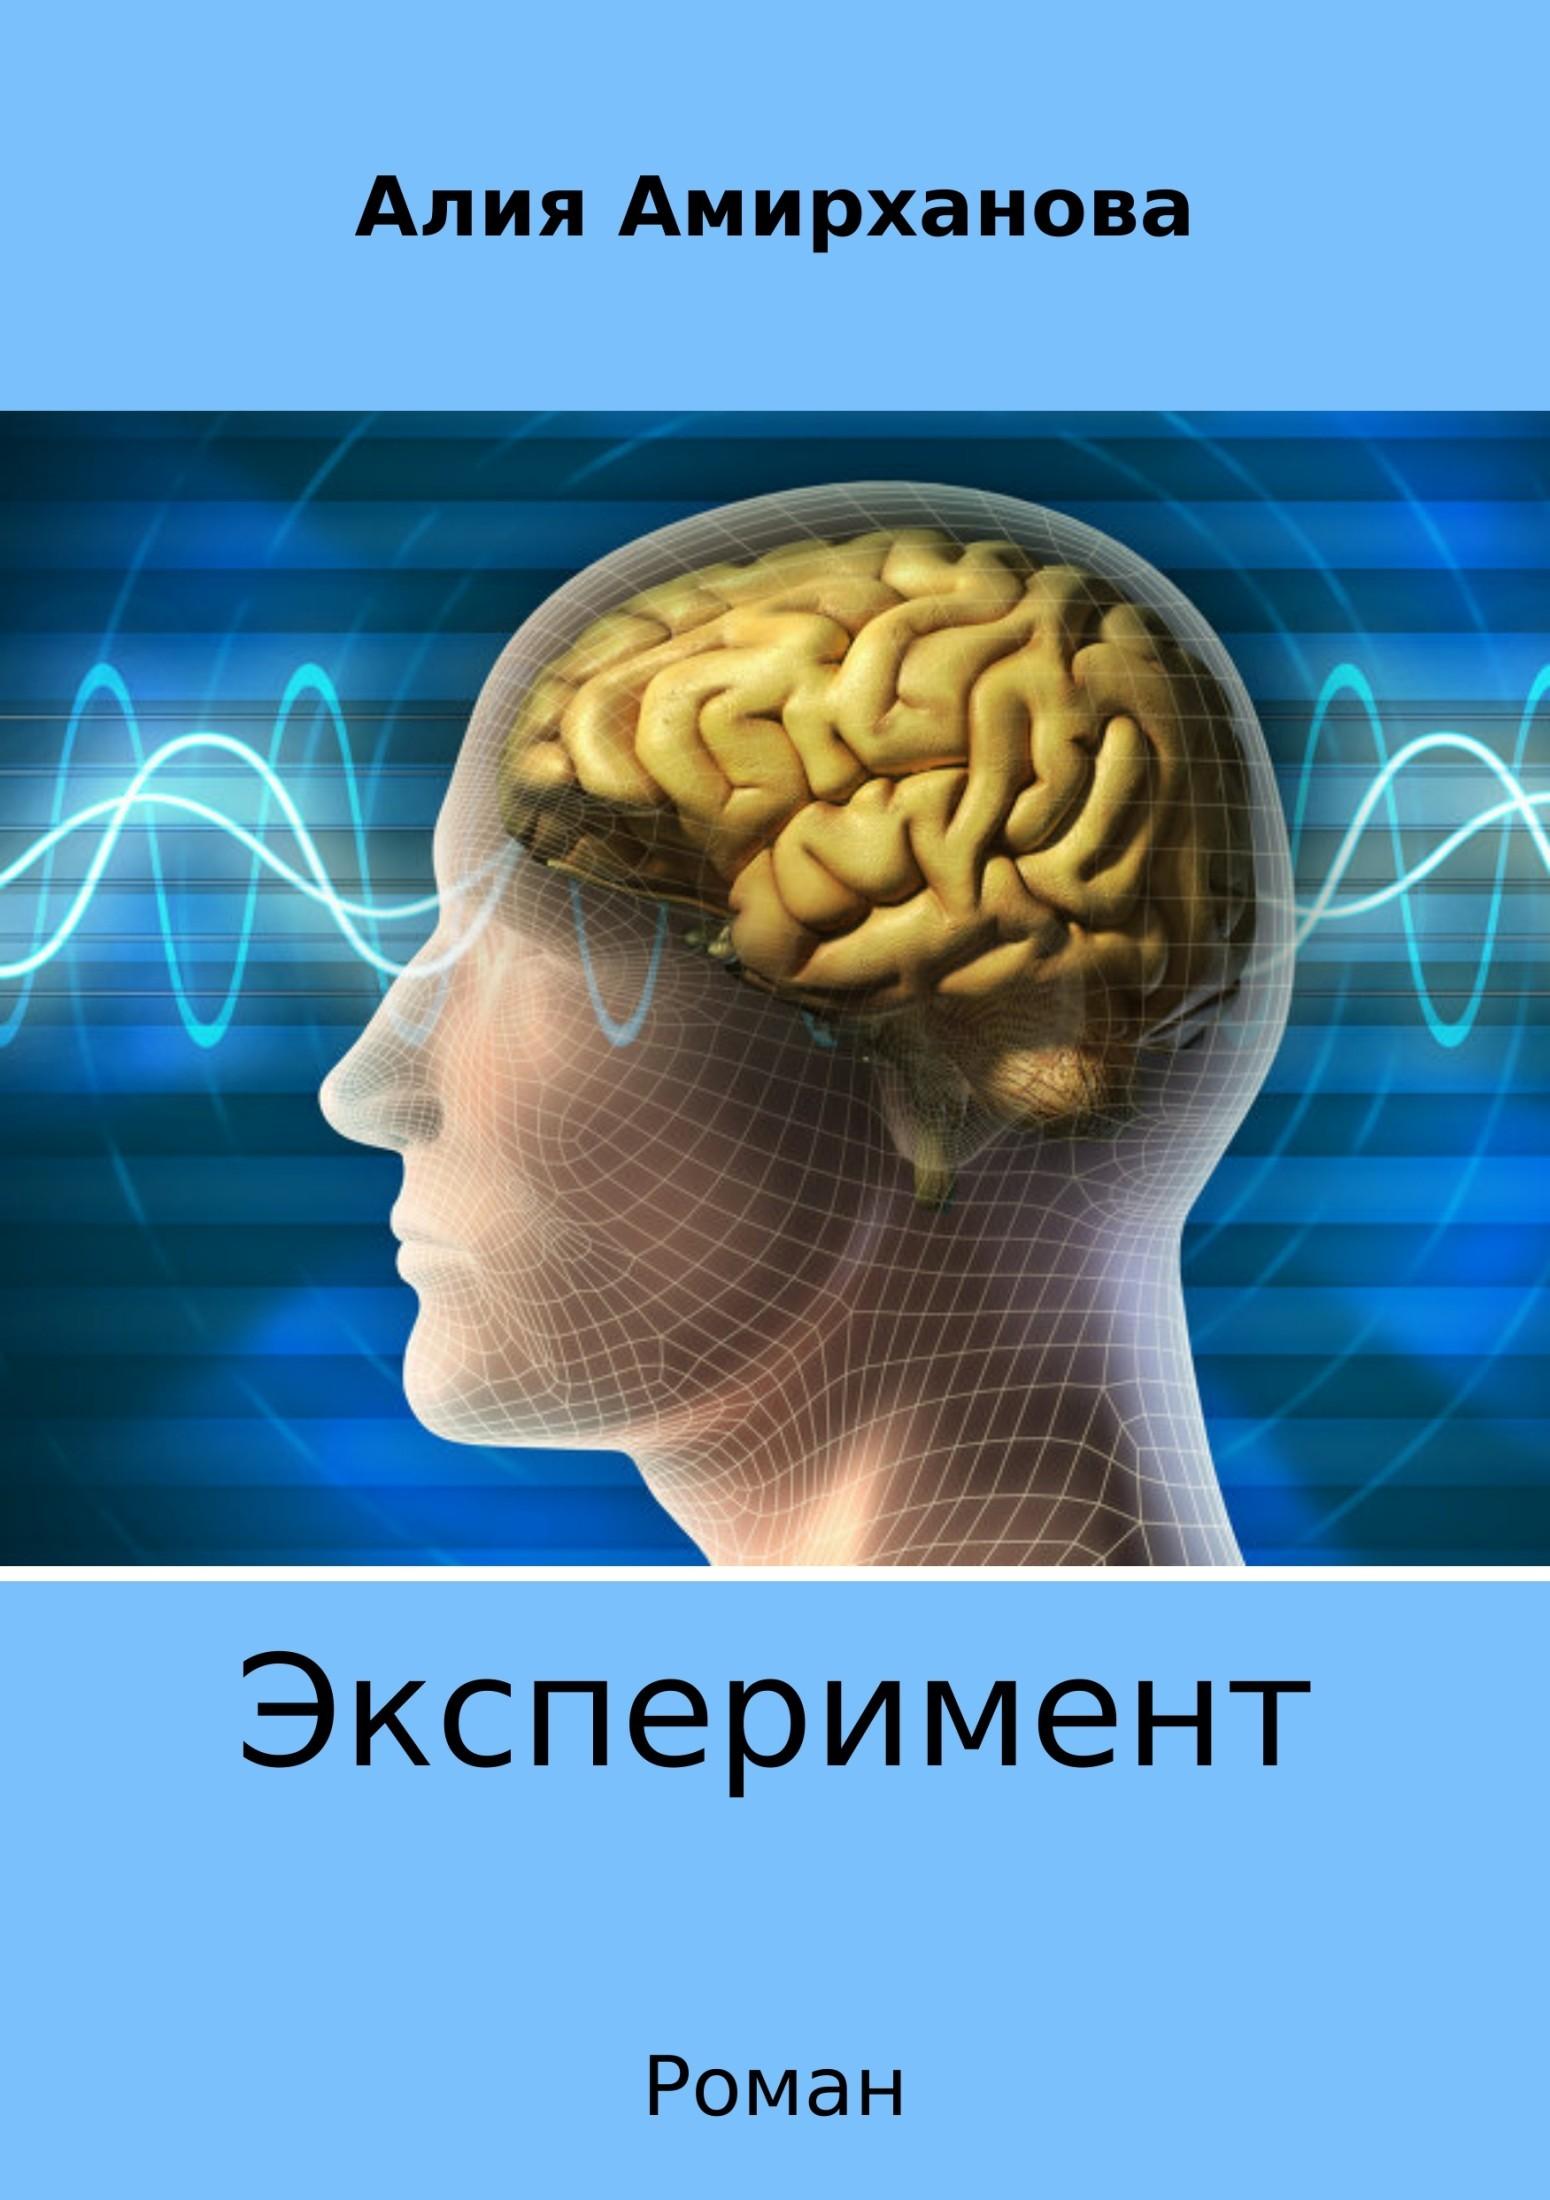 Алия Амирханова Эксперимент датчики дождя